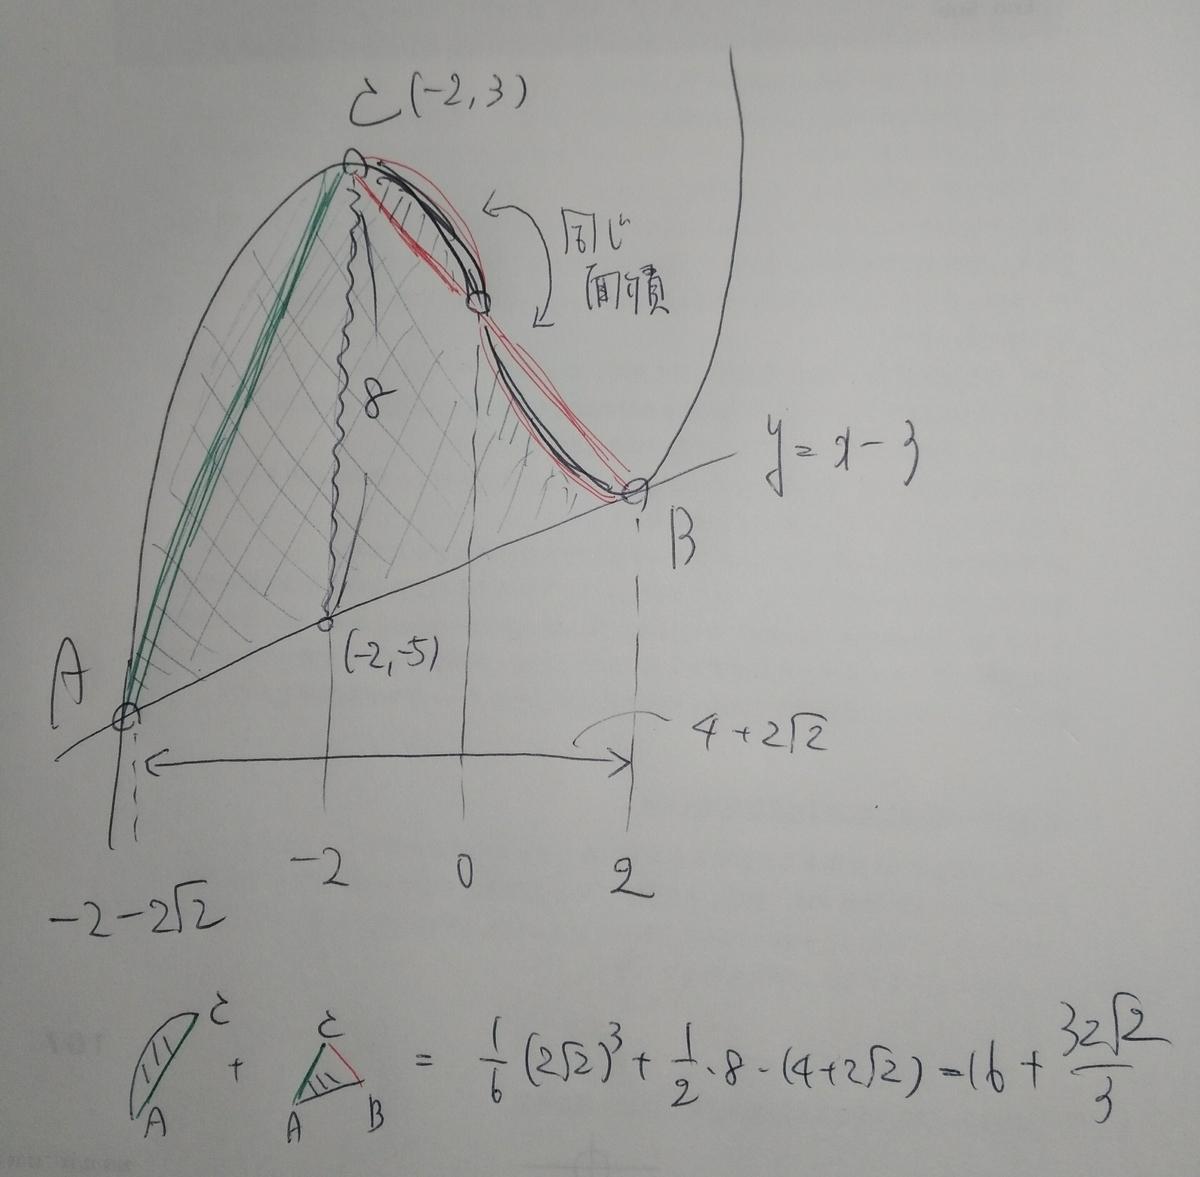 f:id:phi_math:20200328005351j:plain